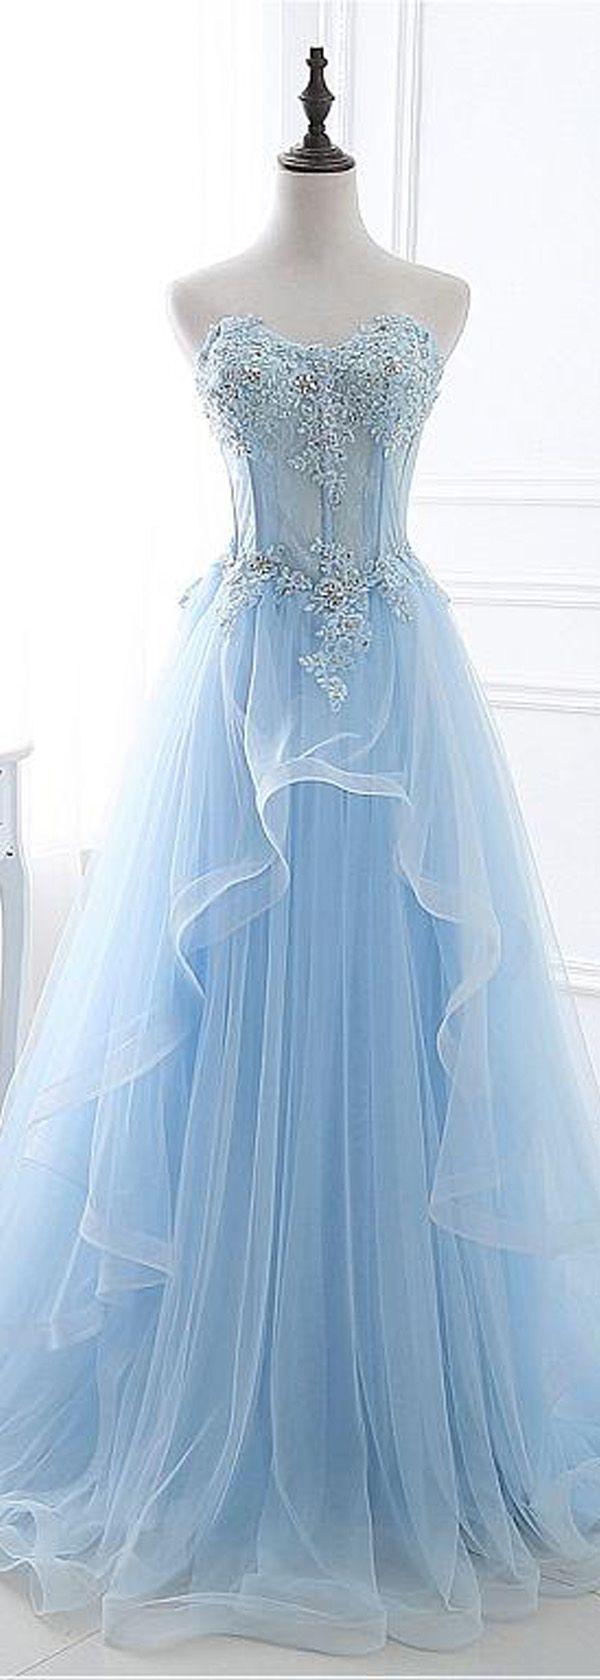 534 best Gowns images on Pinterest | Party wear dresses, Bridal ...